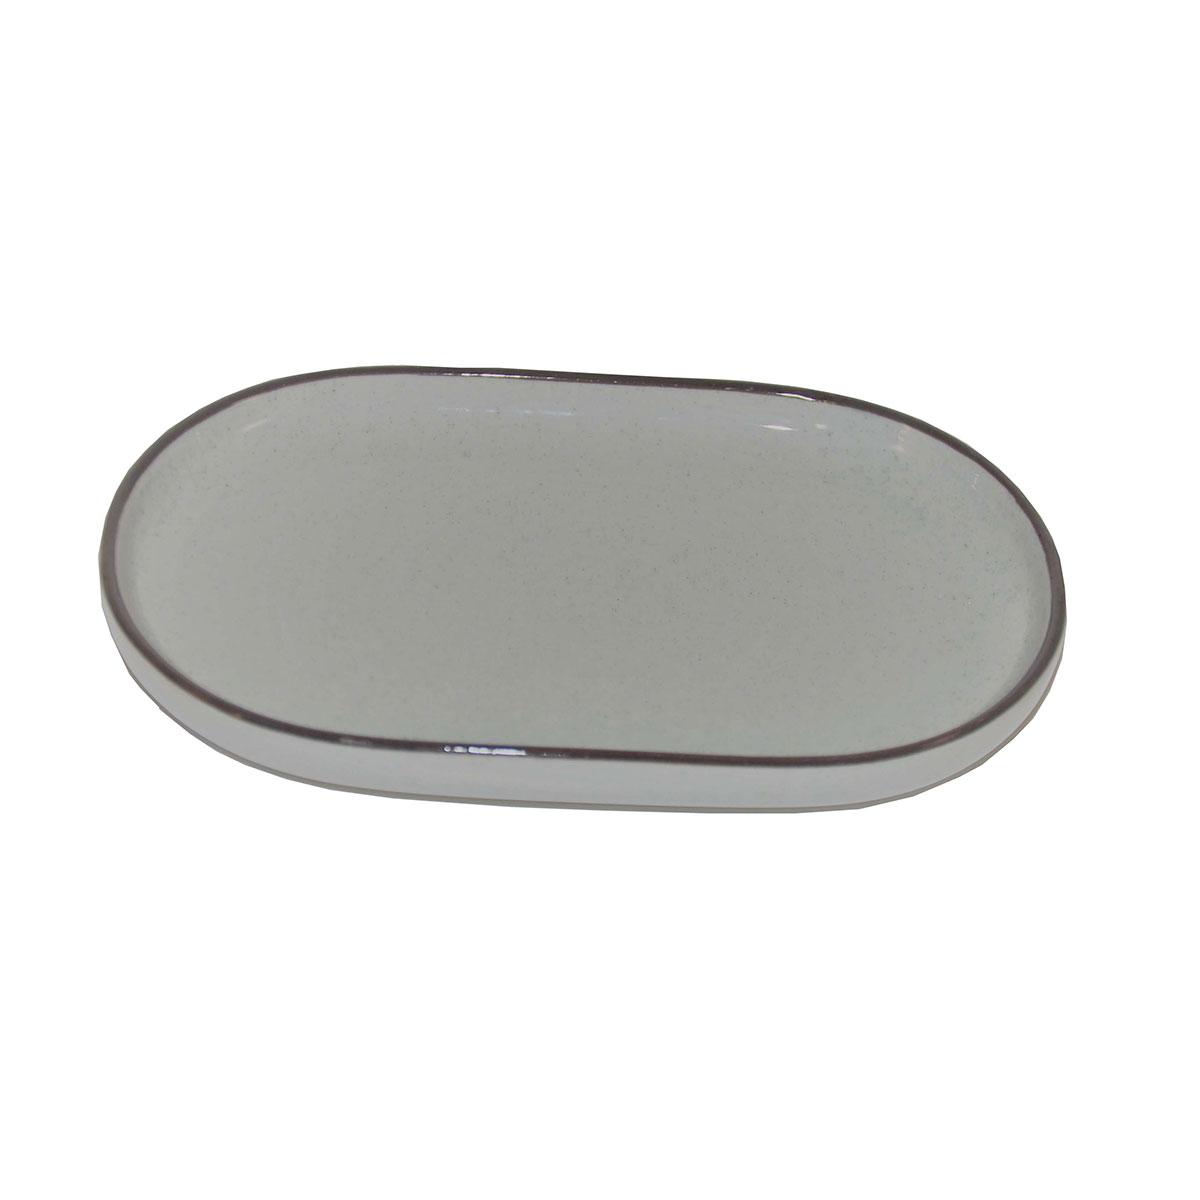 Porte savon ovale et bicolore gris